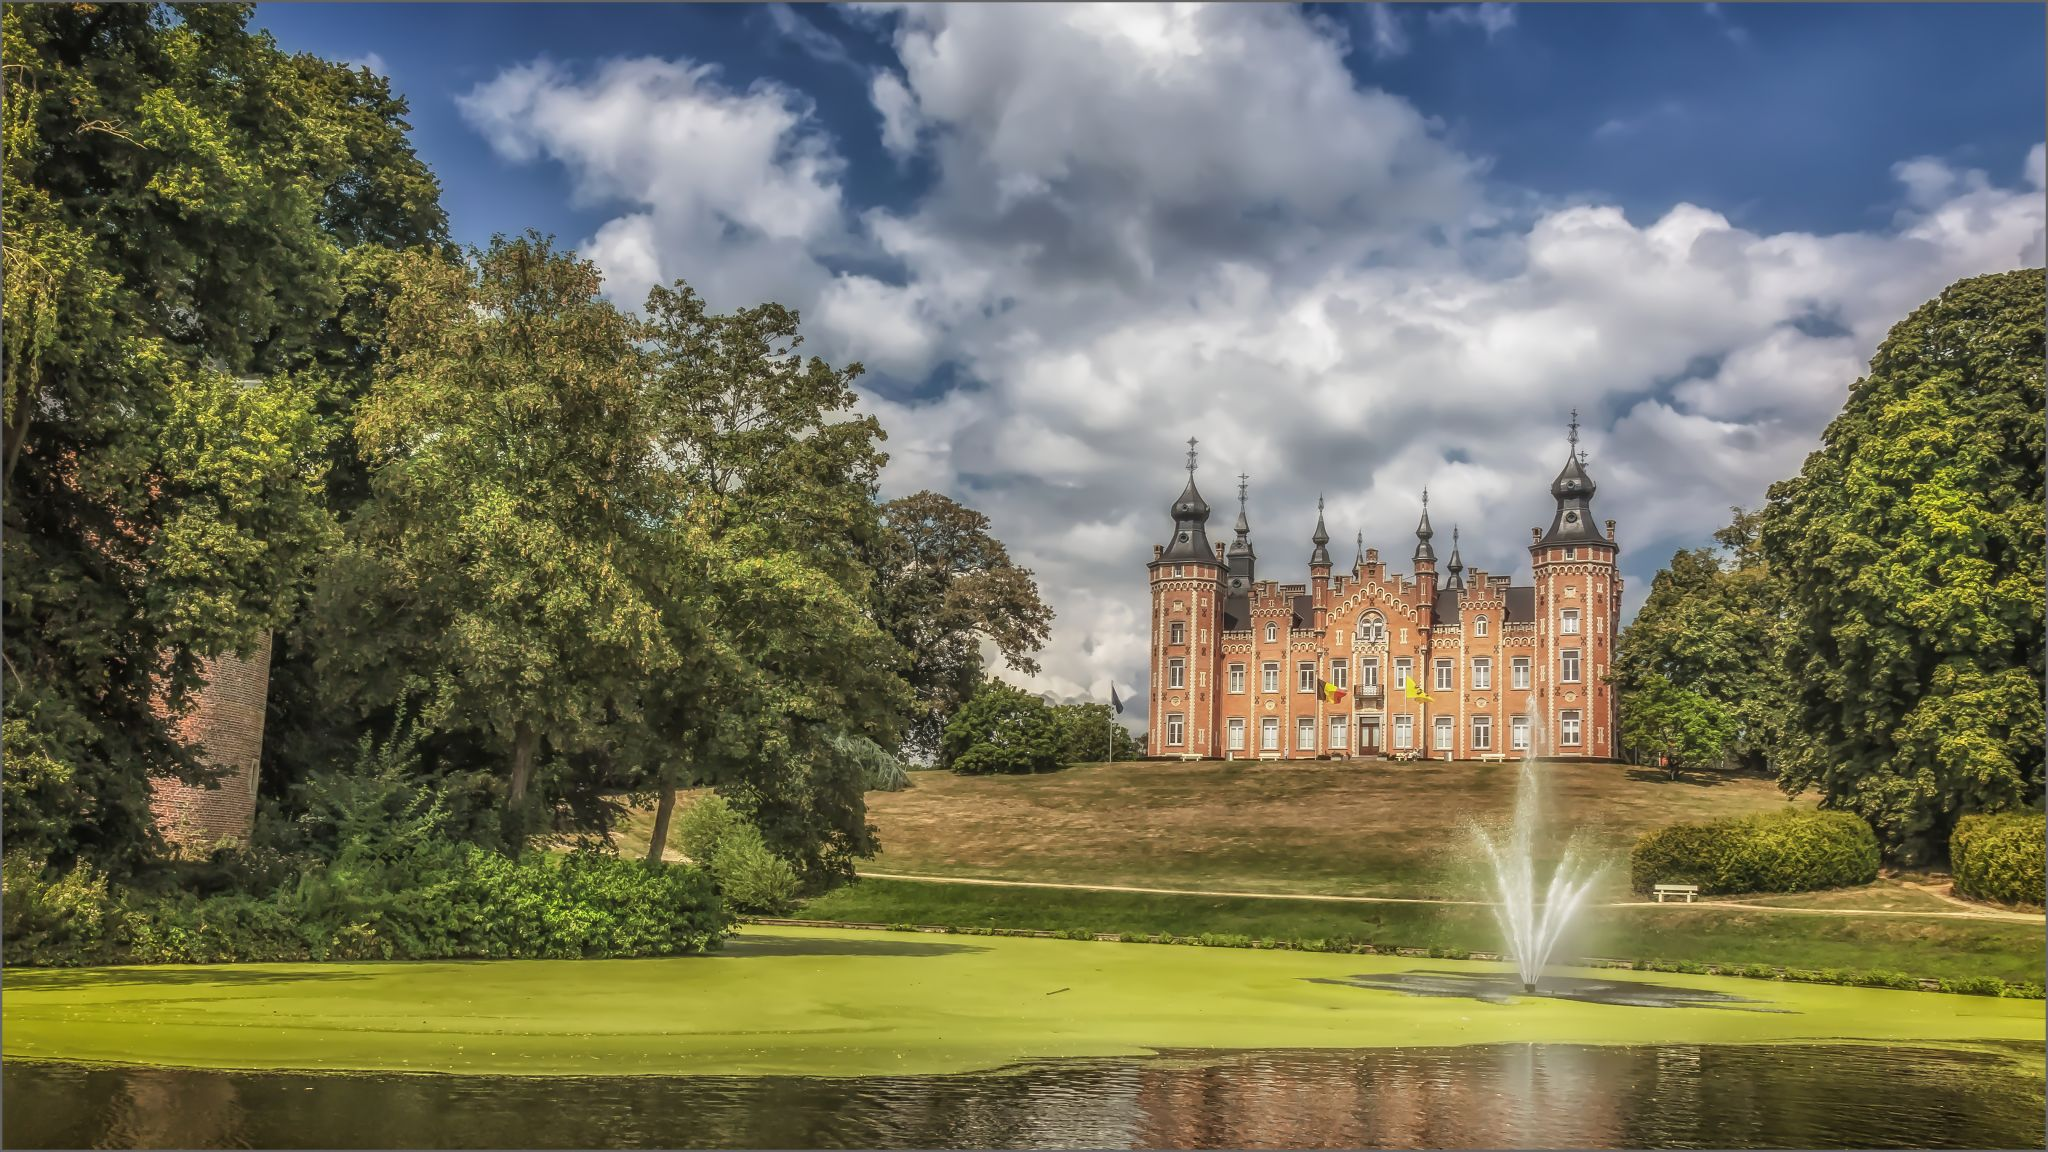 de Viron Castle, Belgium